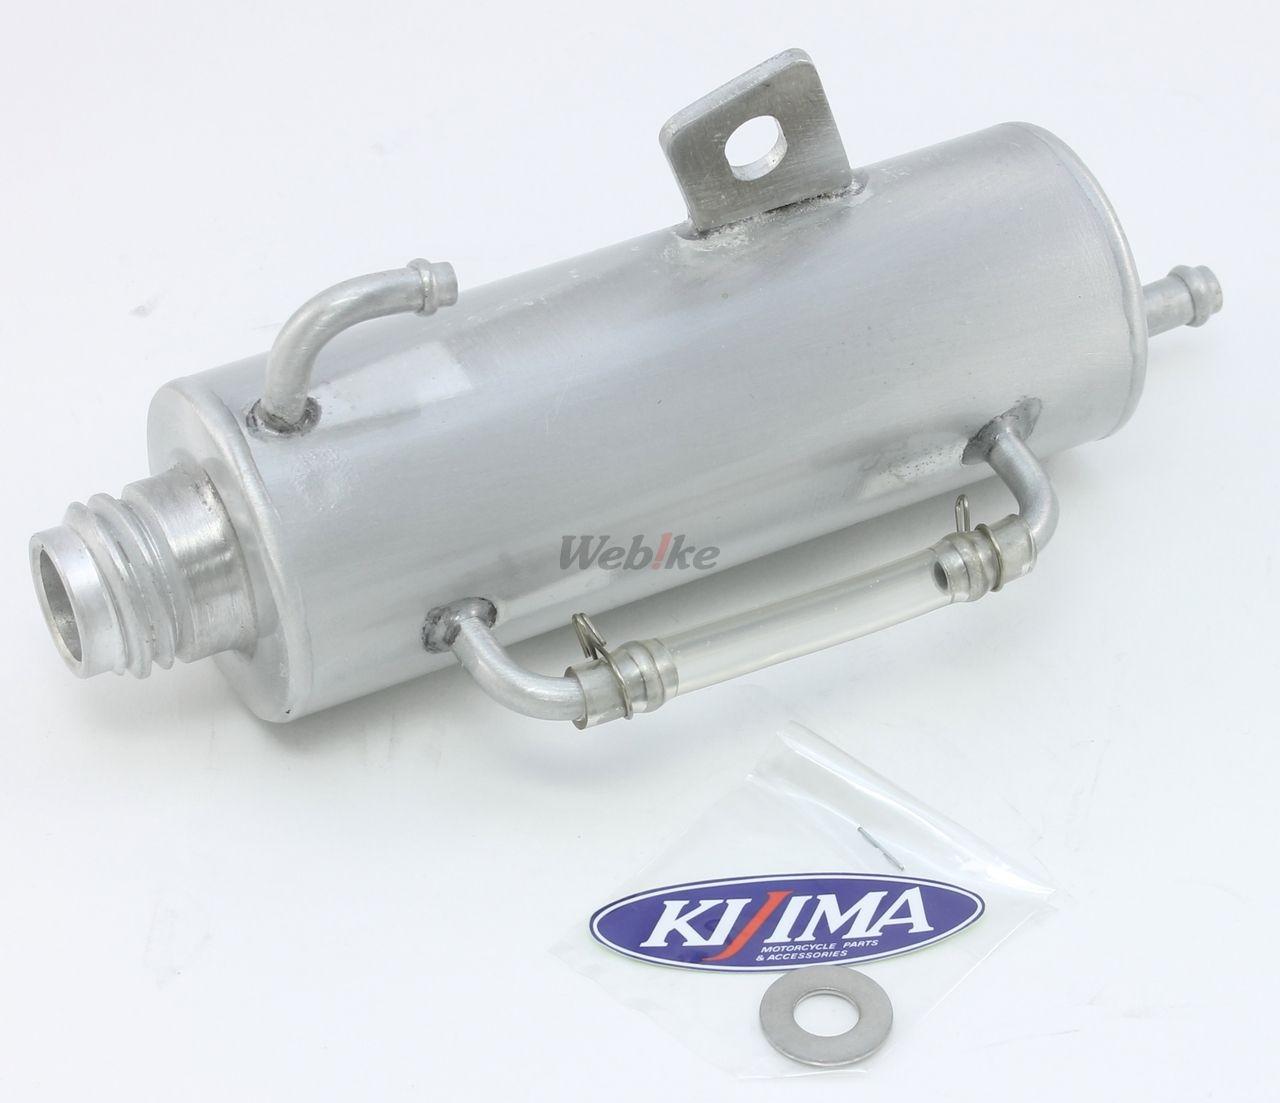 【KIJIMA】散熱器(水箱)副水箱 - 「Webike-摩托百貨」